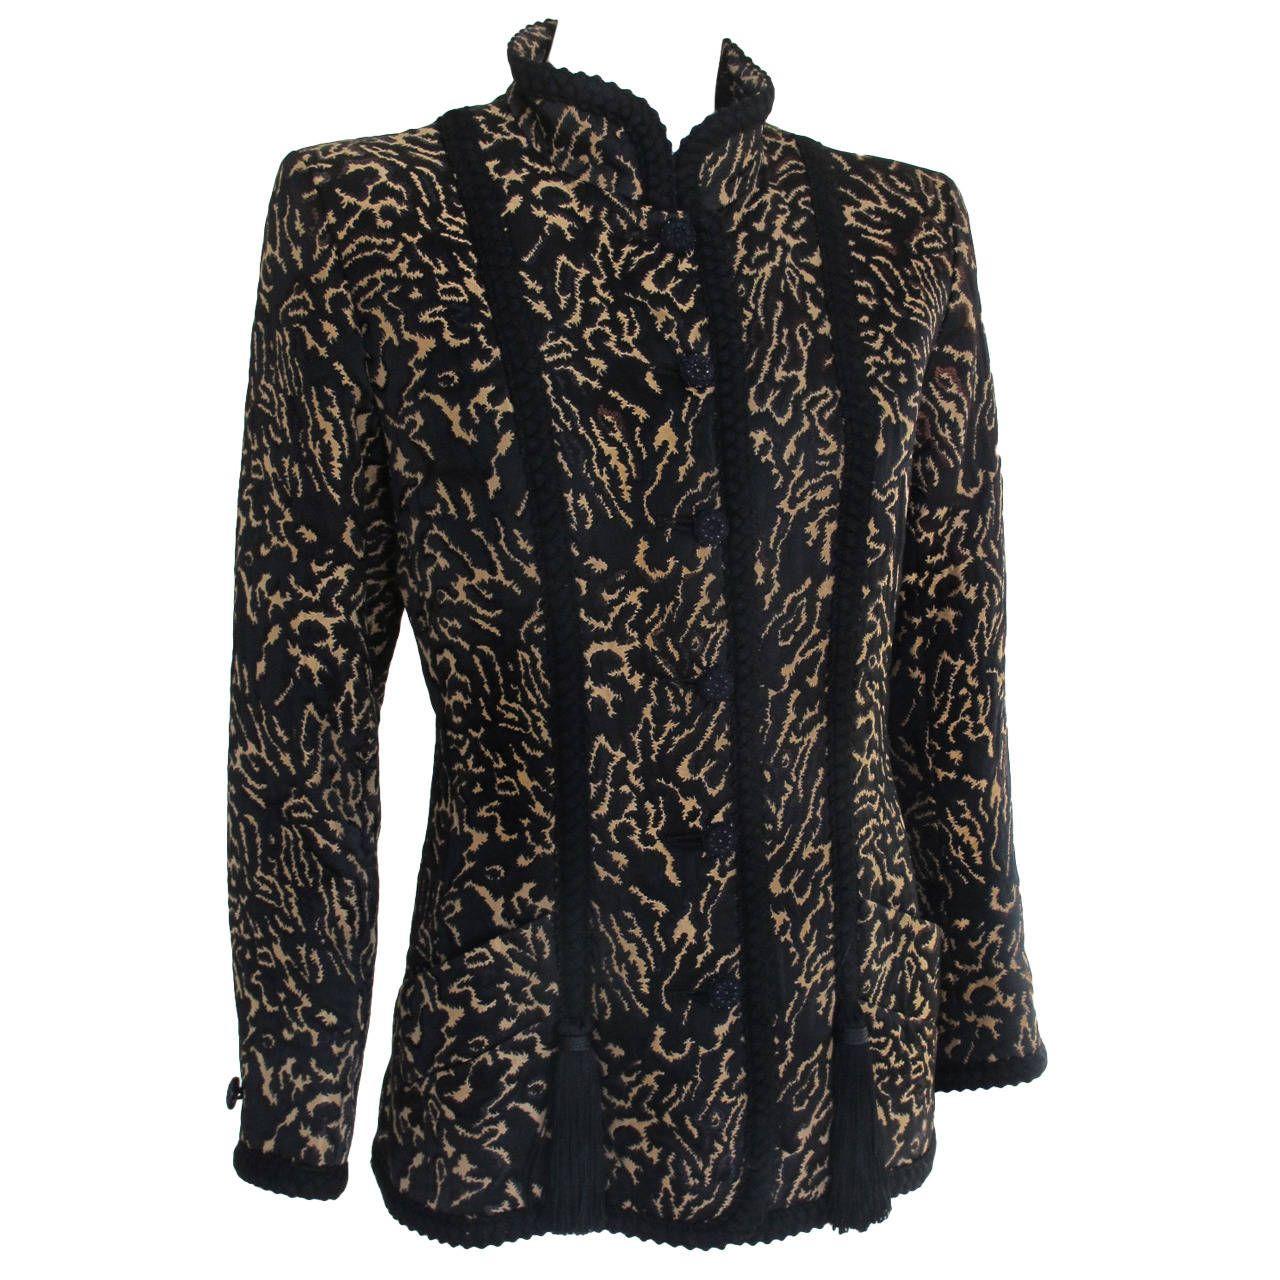 43da1480985 Yves Saint Laurent Silk Brocade Printed Evening Jacket w/Braid & Tassel  Trim